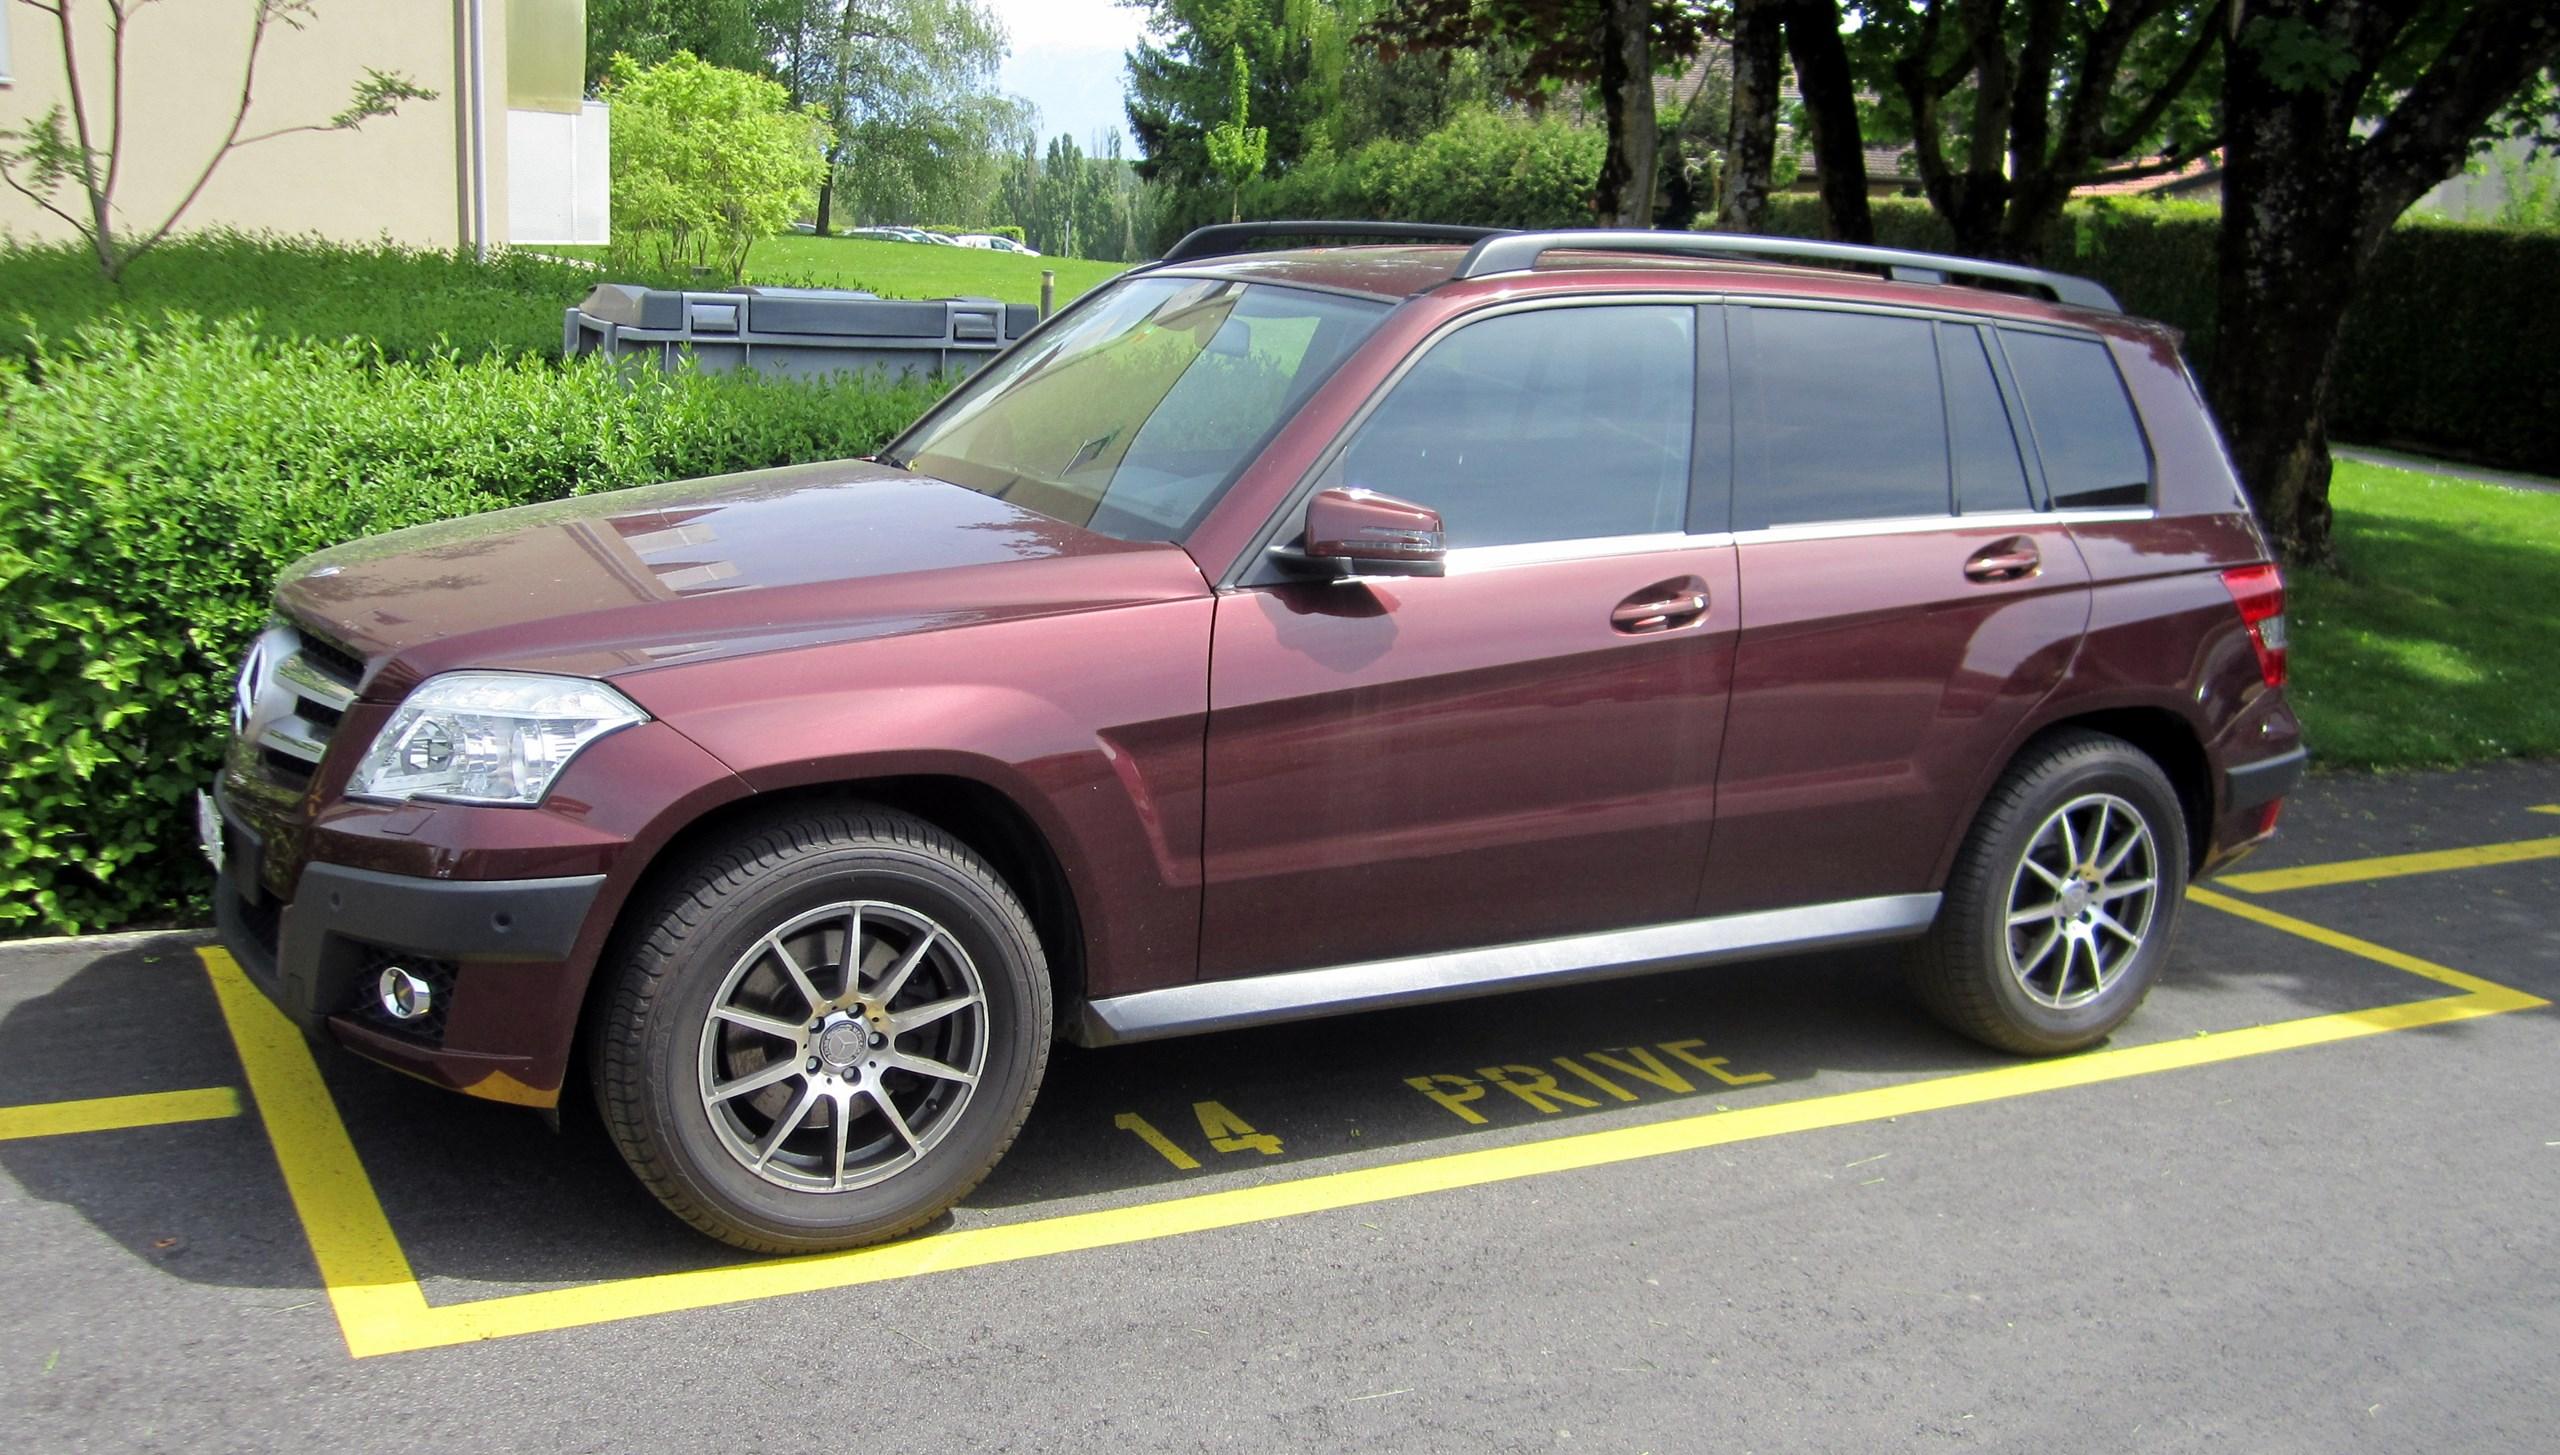 Mercedes-Benz GLK-Klasse X204 GLK 320 V6 CDI 4matic